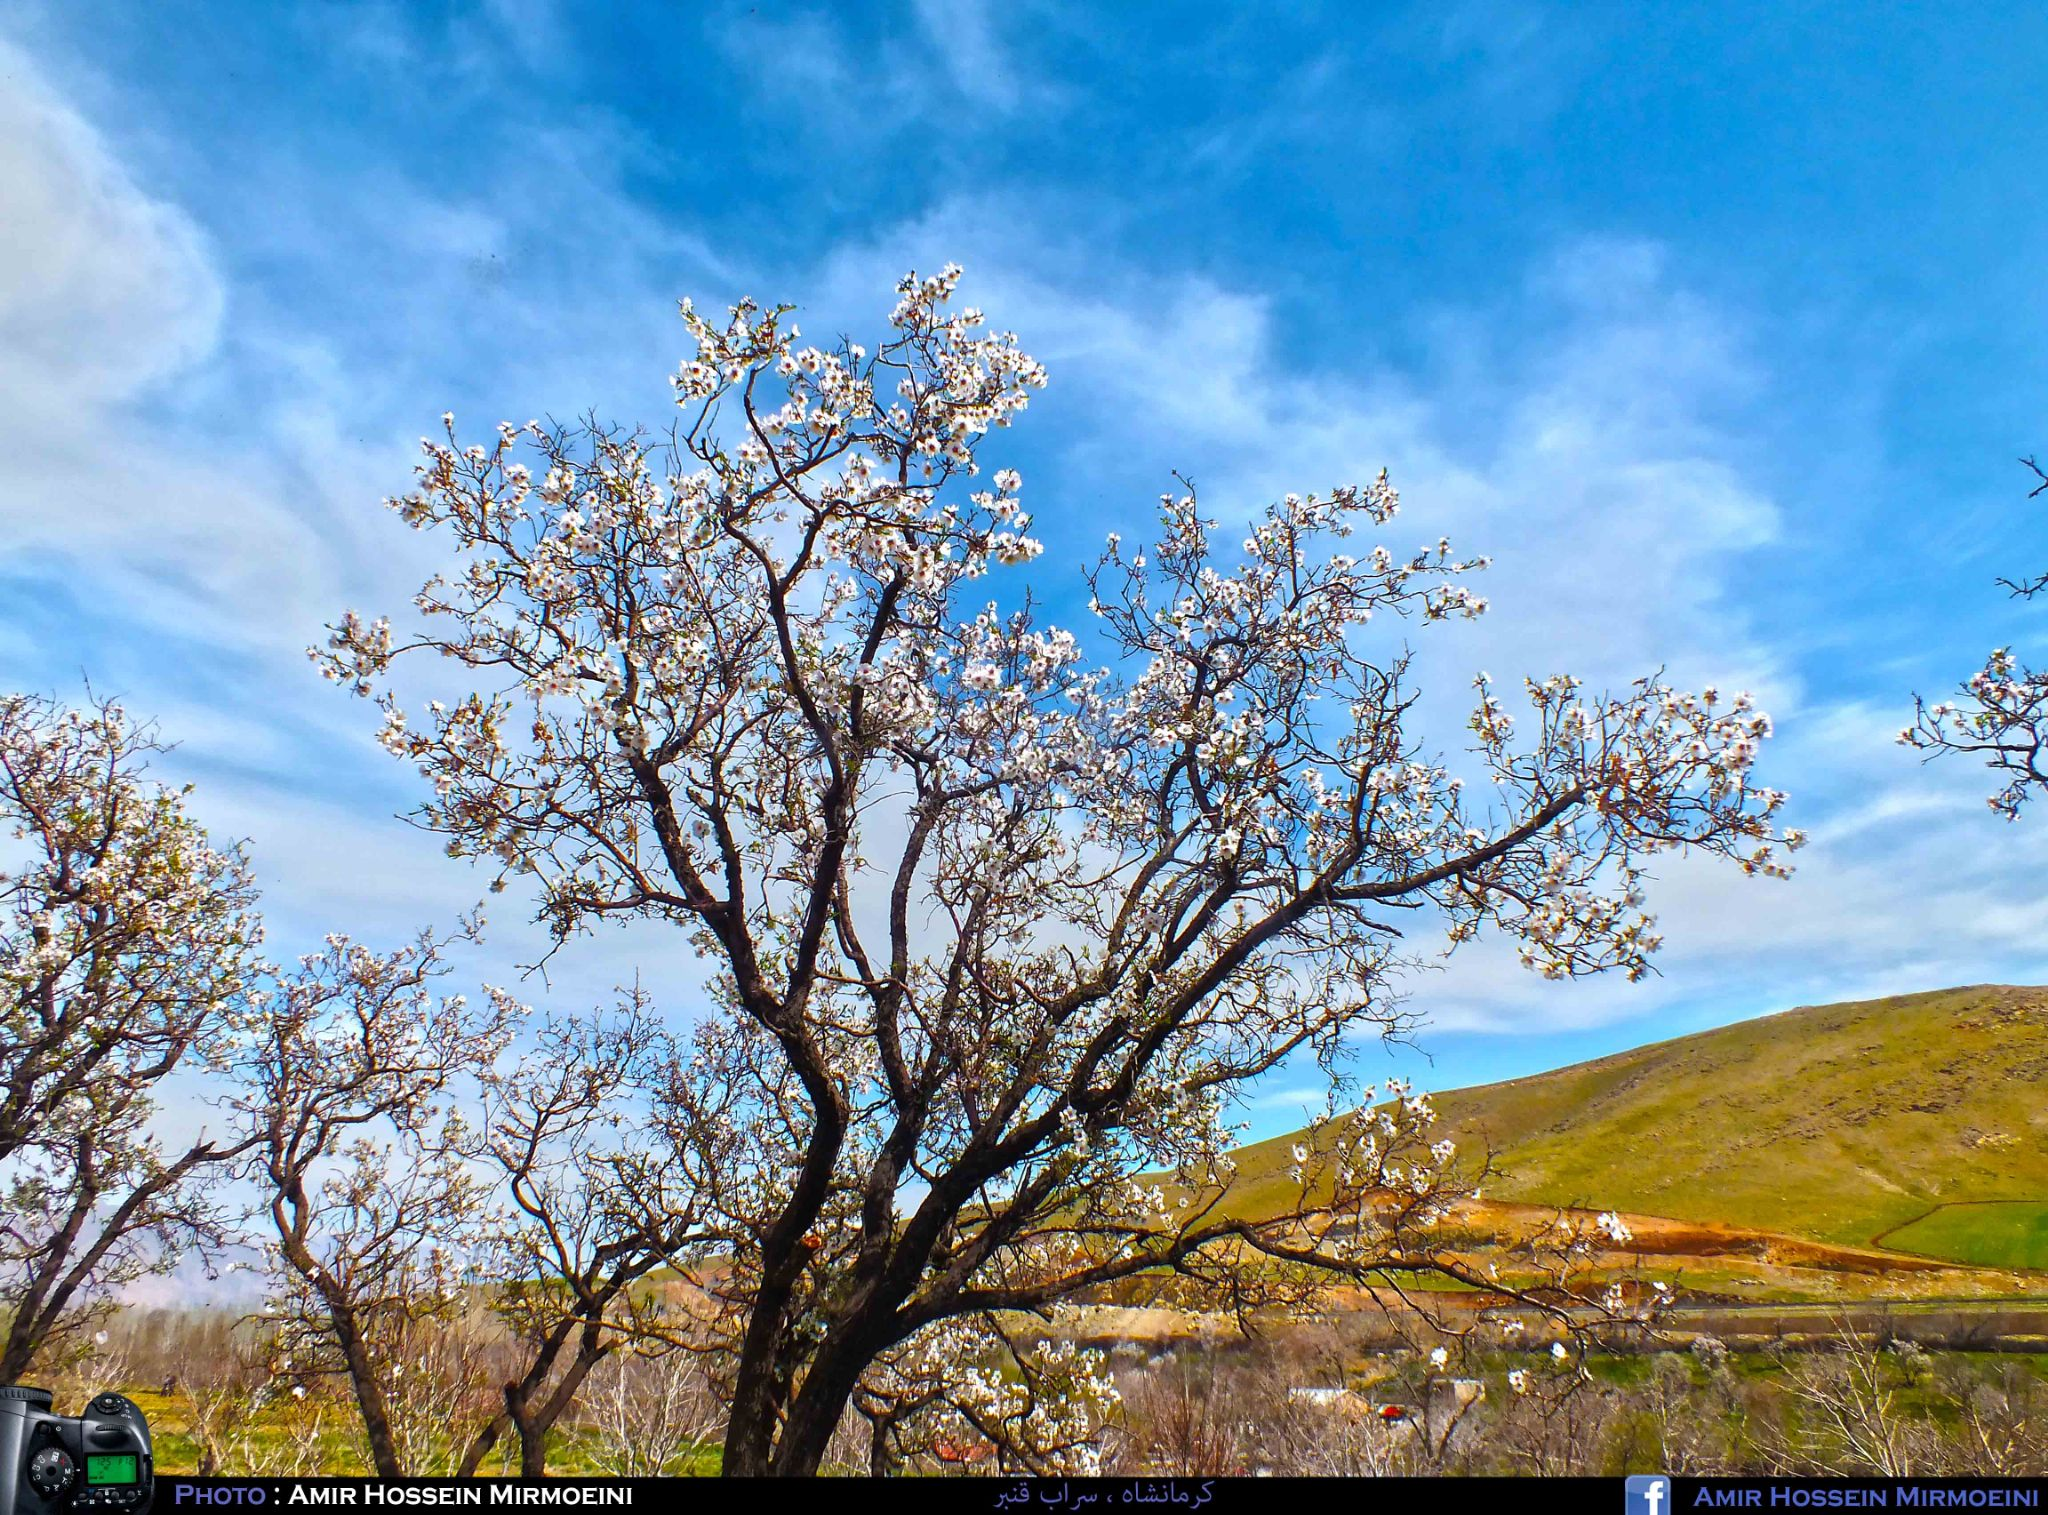 sarab-e Ghanbar - Kermanshah - Iran by Amir Hossein